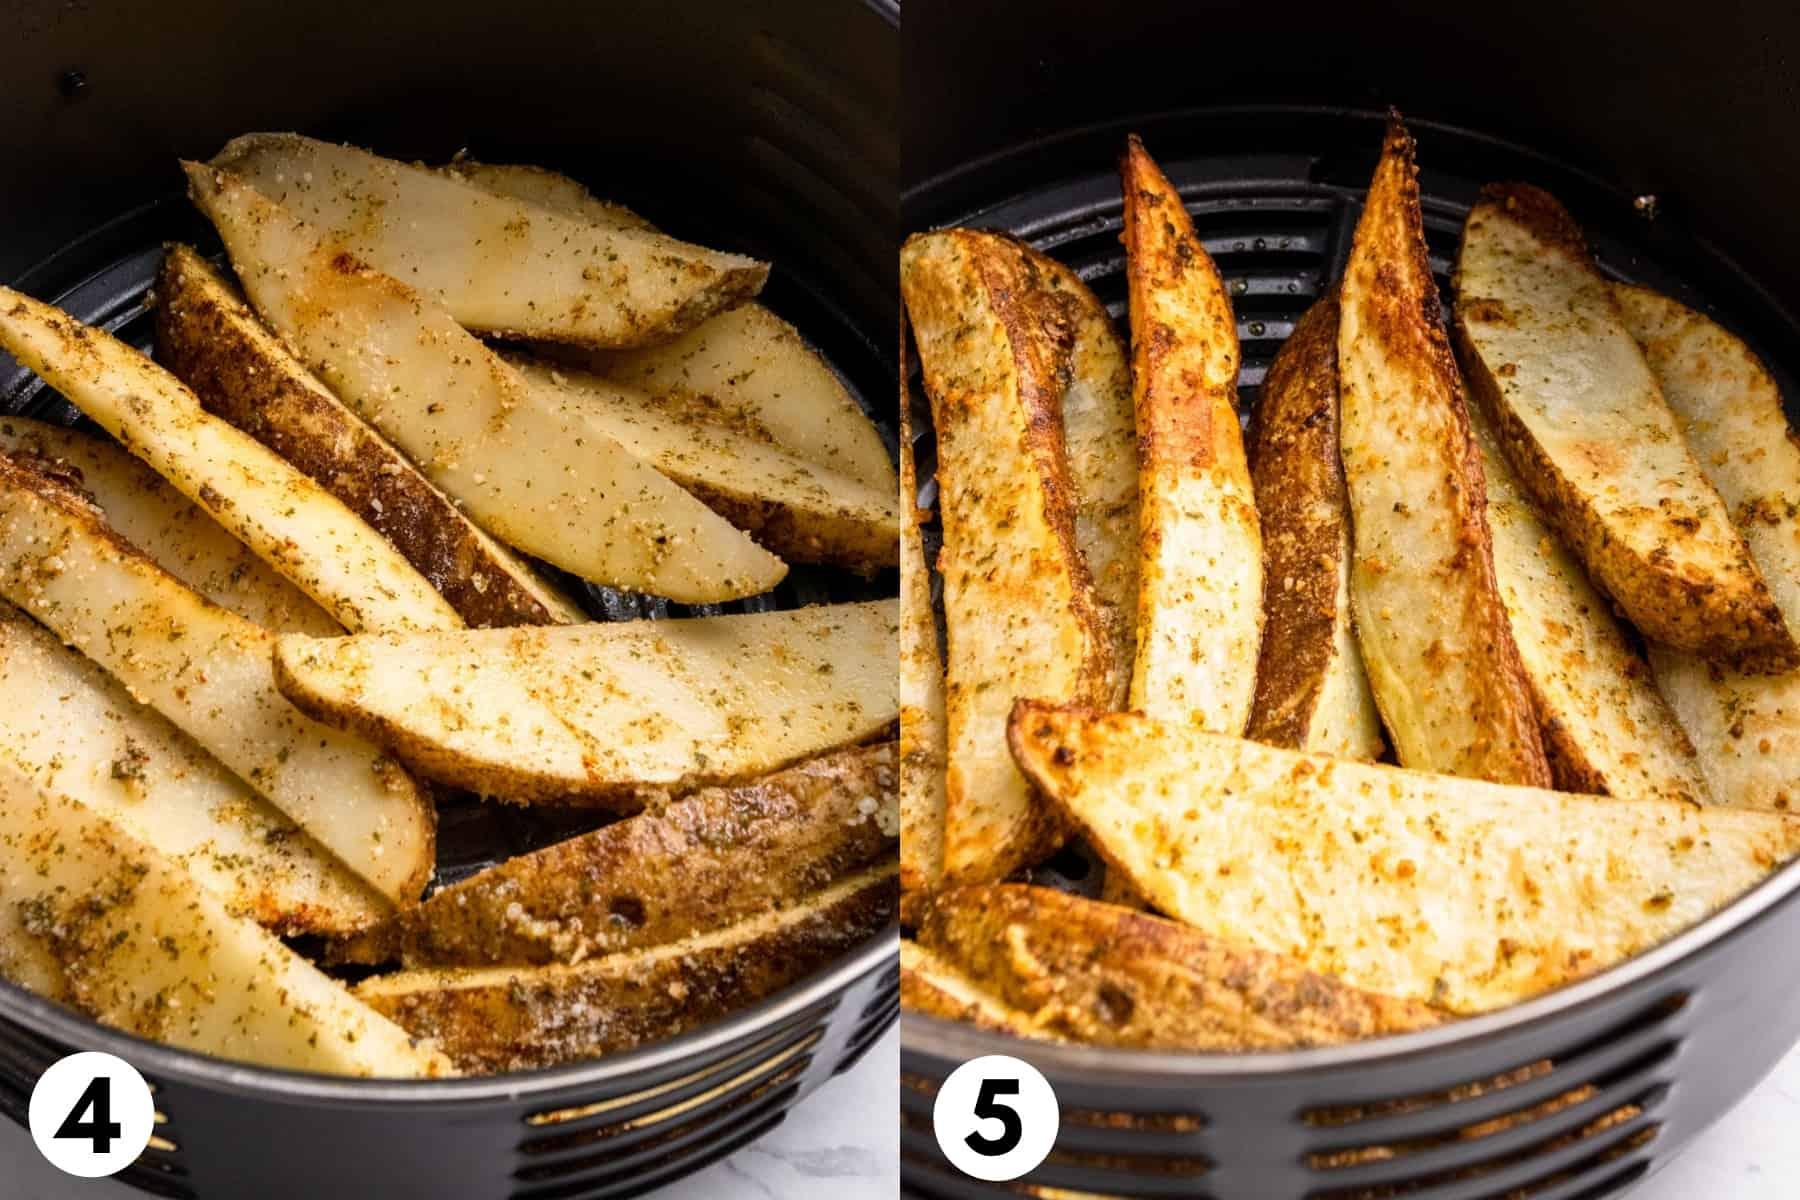 Potato wedges in air fryer.